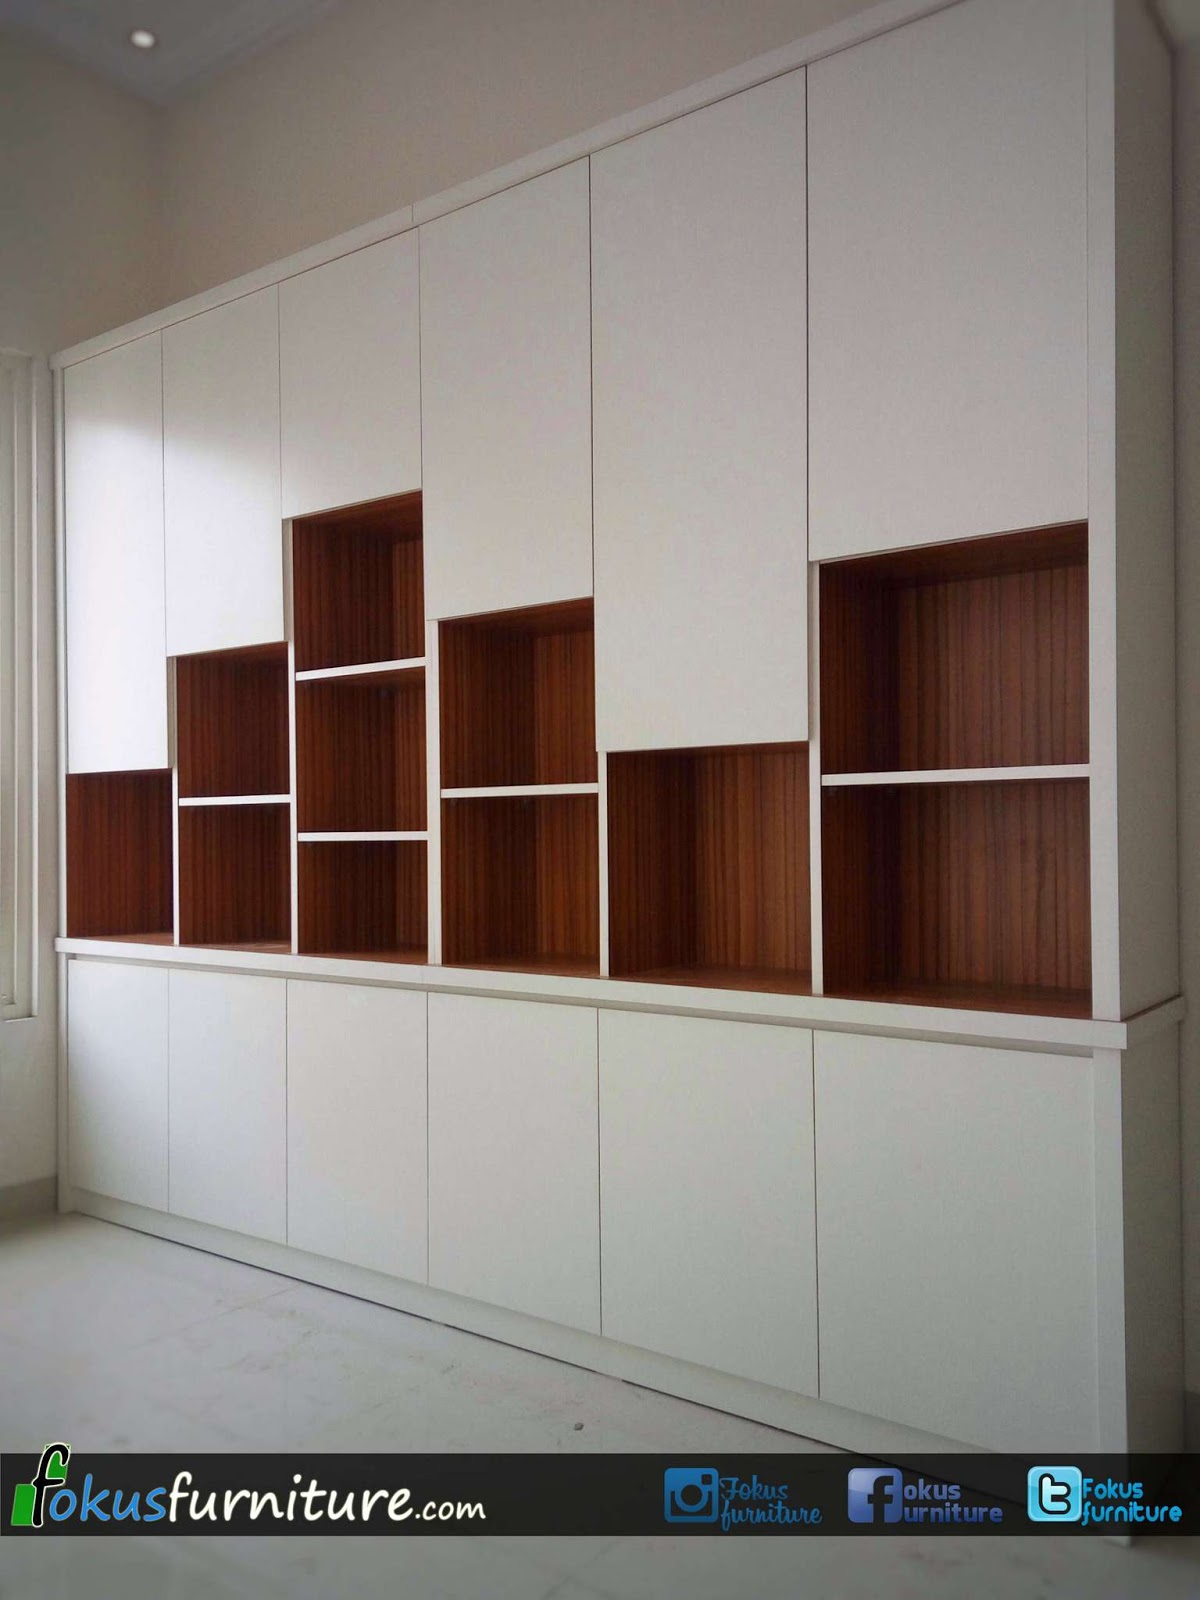 FurnitureKitchen Set Minimalislemari PakaianJakarta